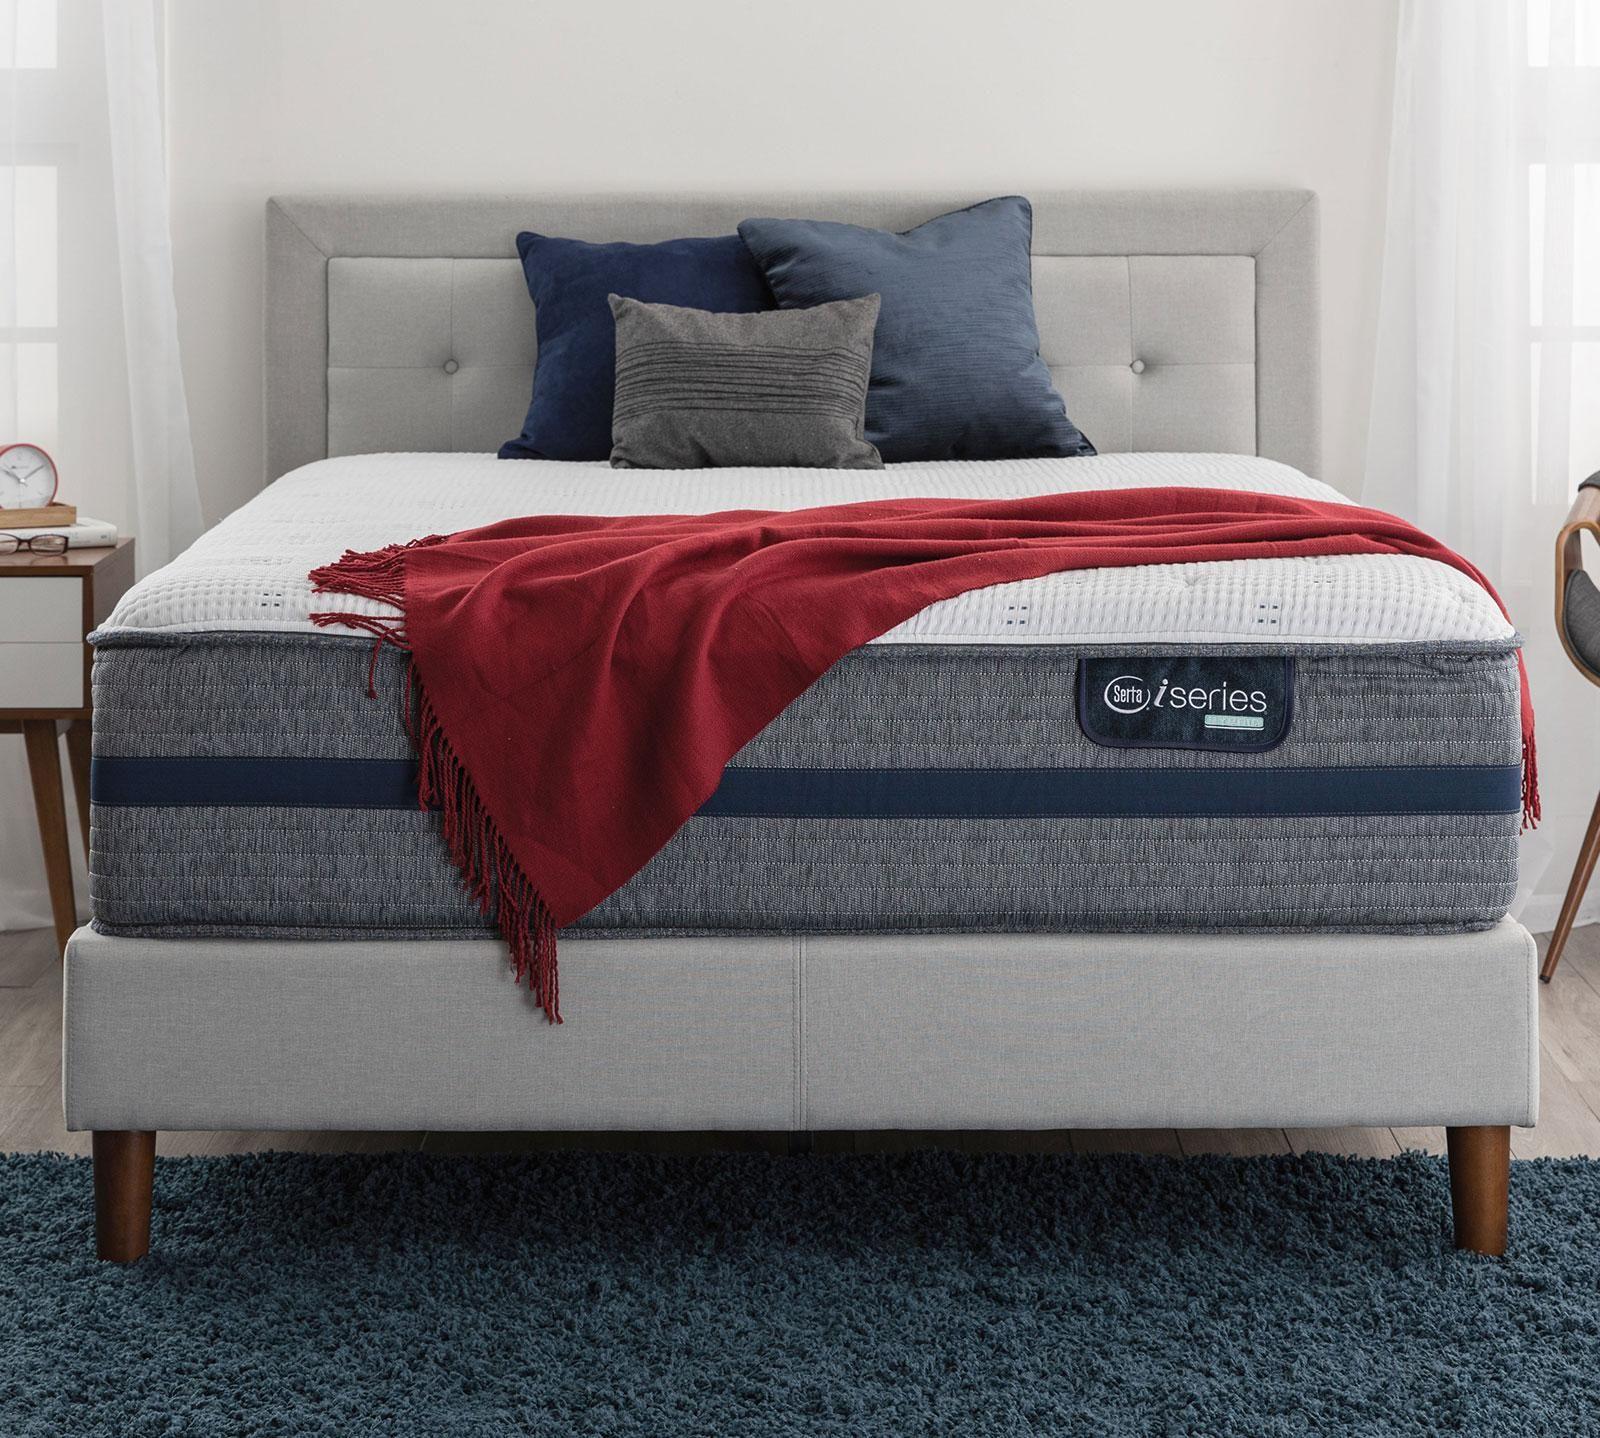 "Serta iSeries Hybrid 500 14"" Cushion Firm Mattress in 2020"